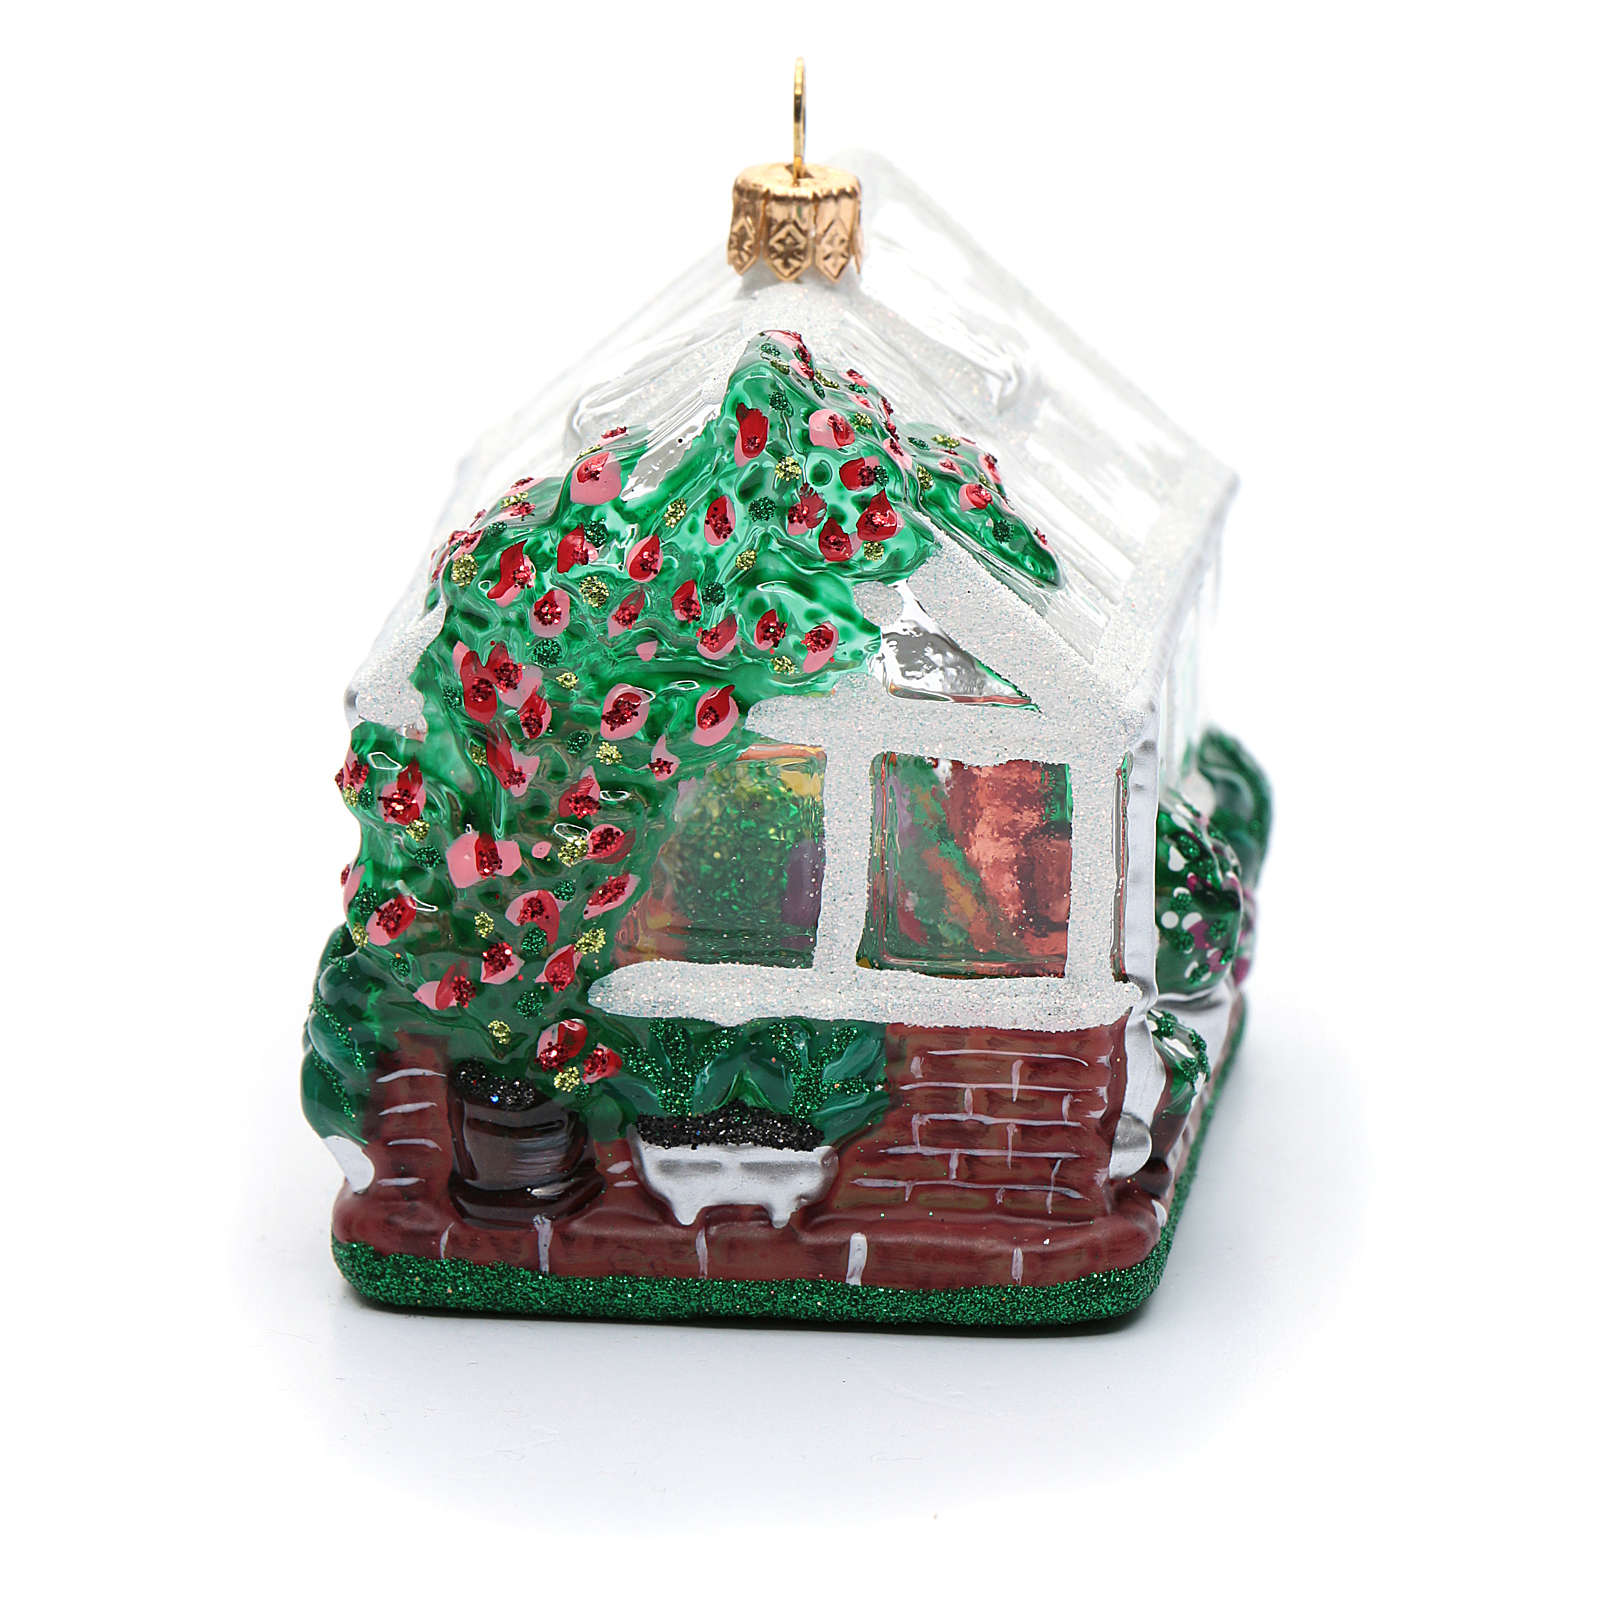 Viveiro vidro soprado adorno árvore Natal 4